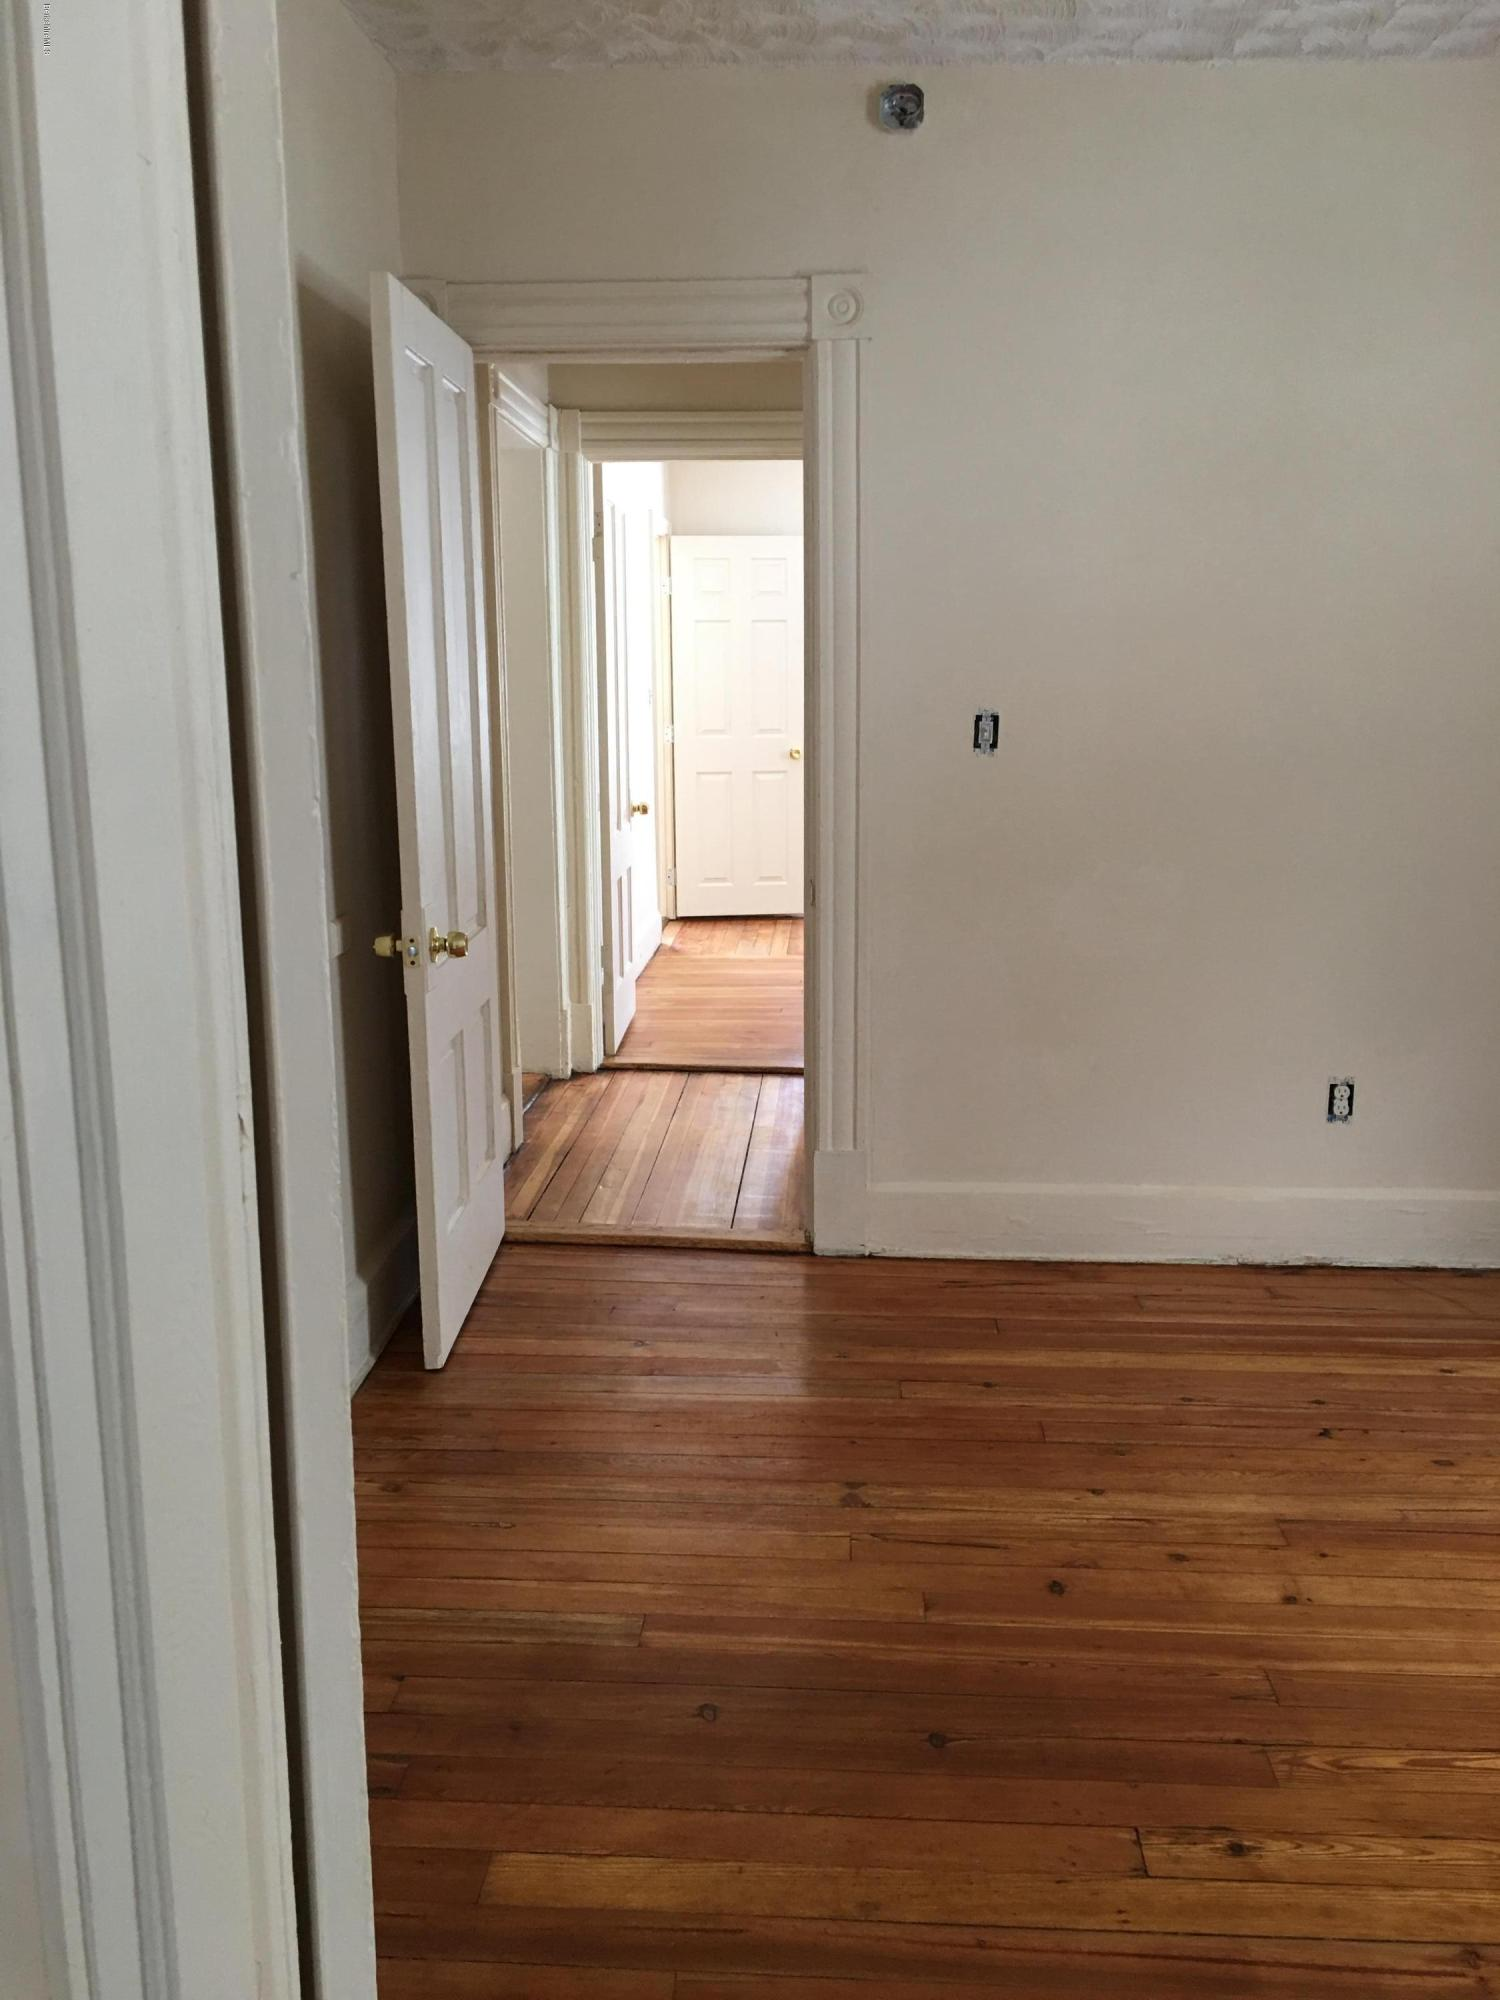 Bedroom#2 upstairs